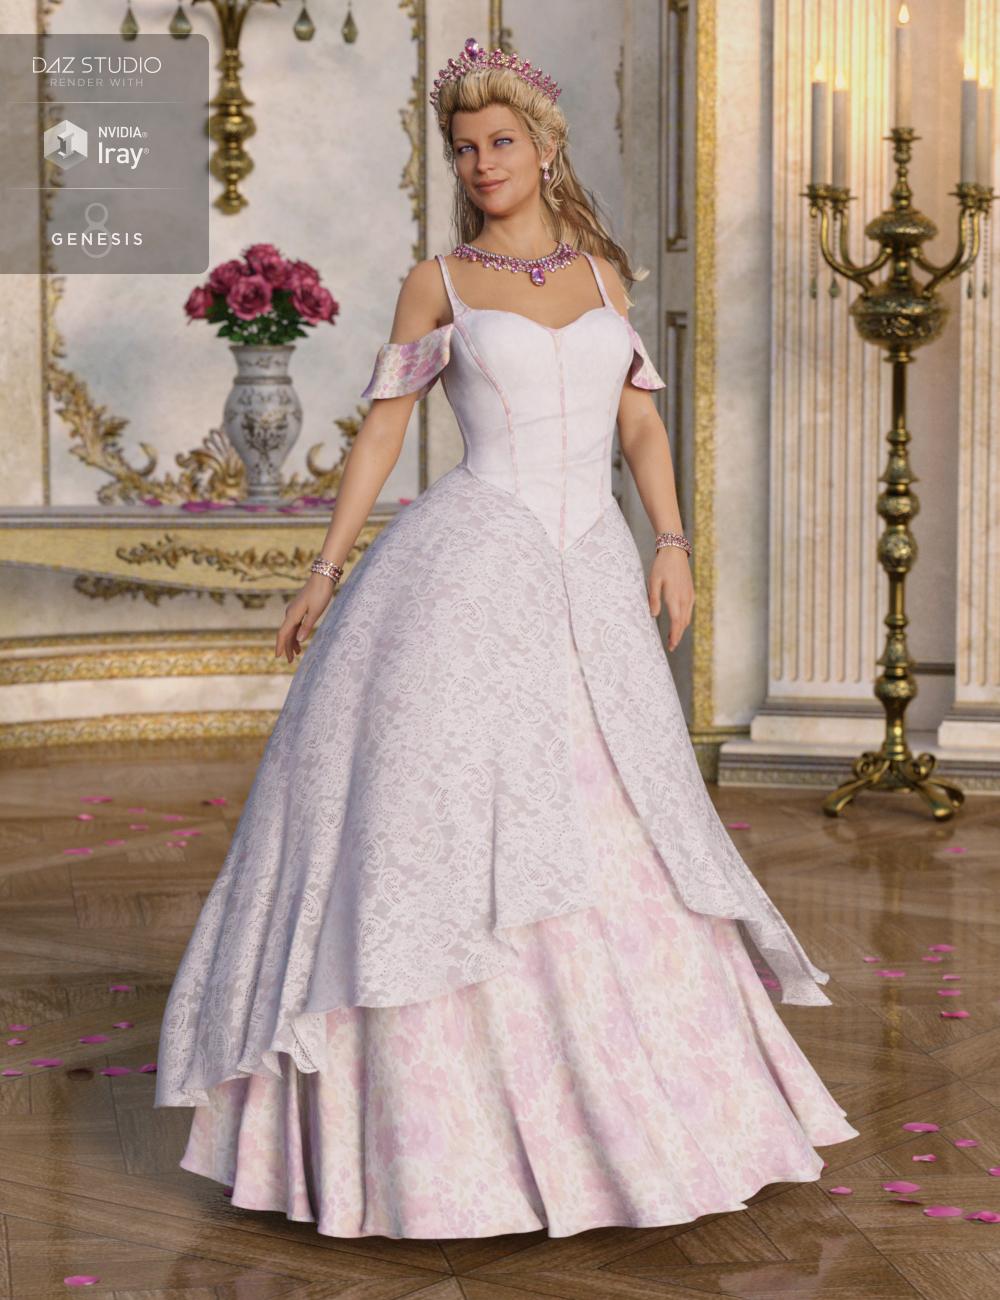 Princess Ensemble for Genesis 8 Female(s) by: Anna BenjaminBarbara BrundonUmblefugly, 3D Models by Daz 3D